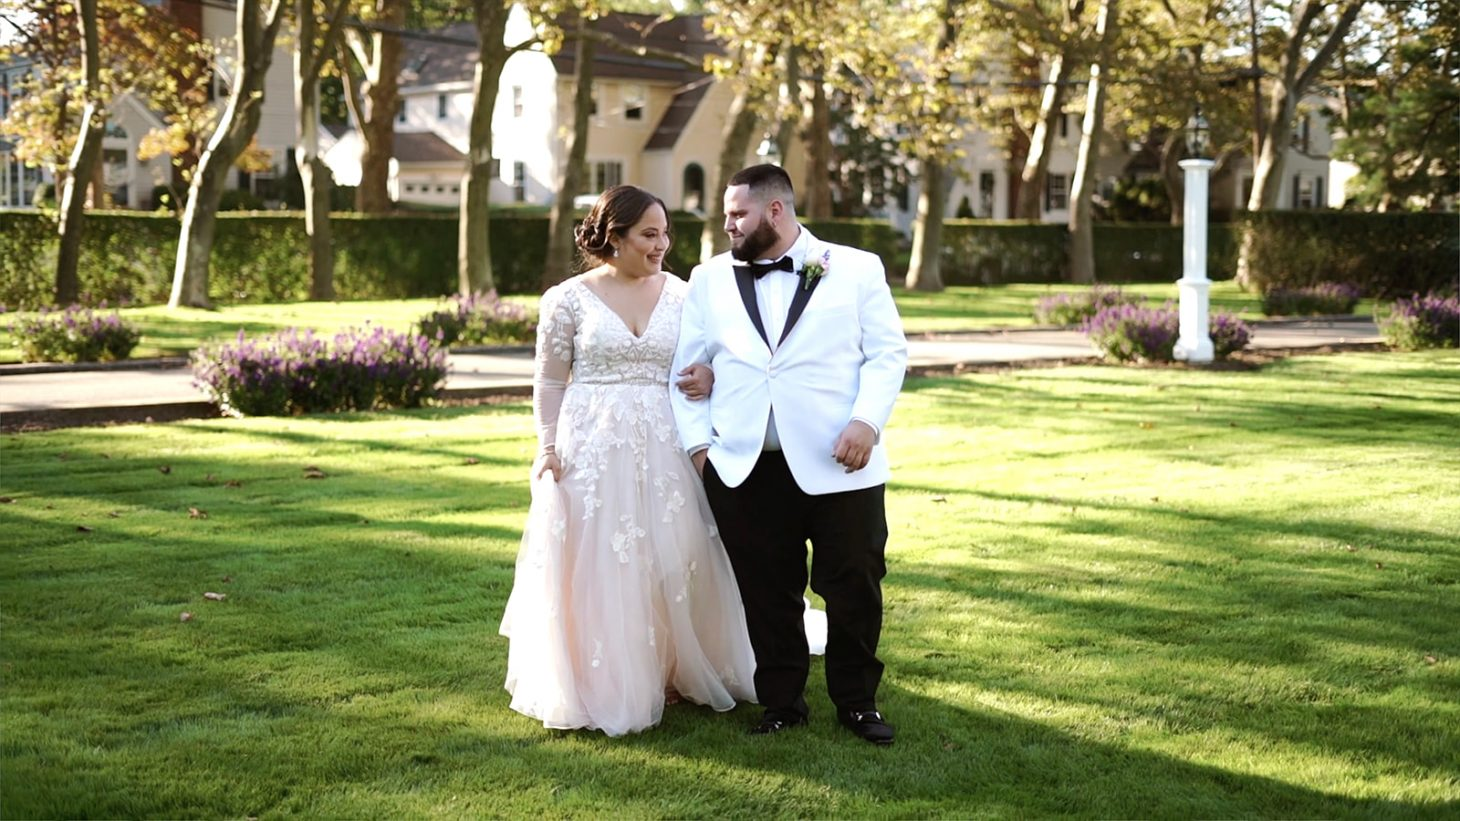 Long Island Wedding Videographer, Stewart Manor Wedding Video, Stewart Manor Wedding, Stewart Manor Country Club Wedding, Stewart Manor Country Club Wedding Video